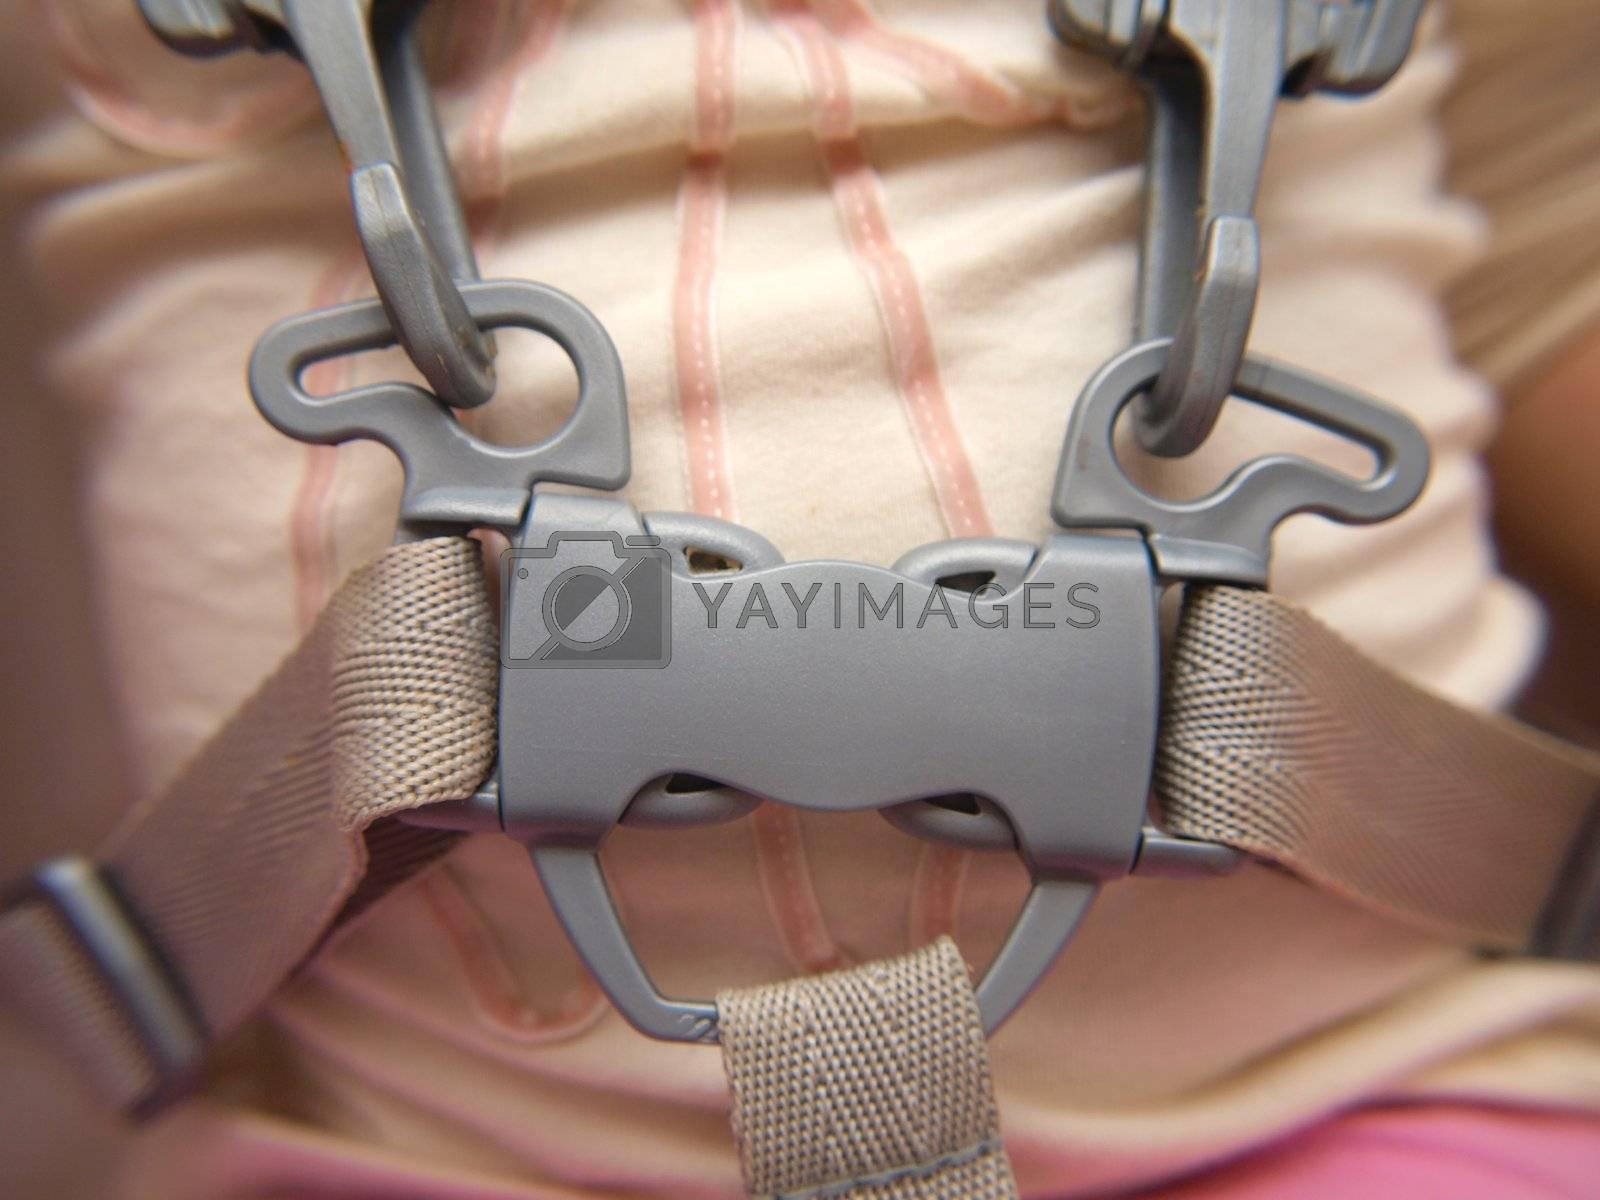 Closeup of a toddler wearing a belt, locked